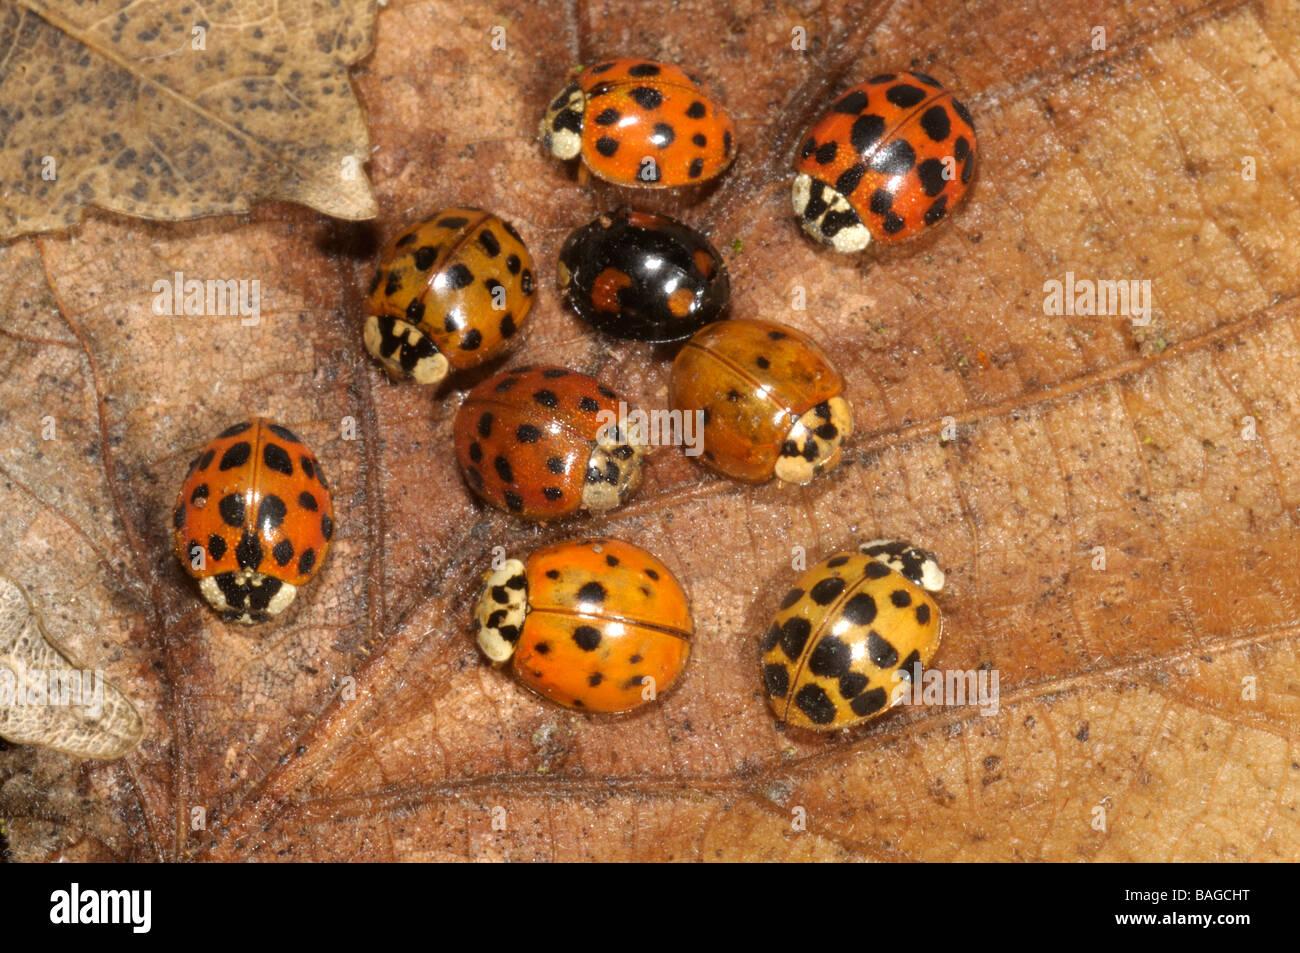 Asian Lady Beetle (Harmonia axyridis), beetles hibernating under dry leaves in winter - Stock Image